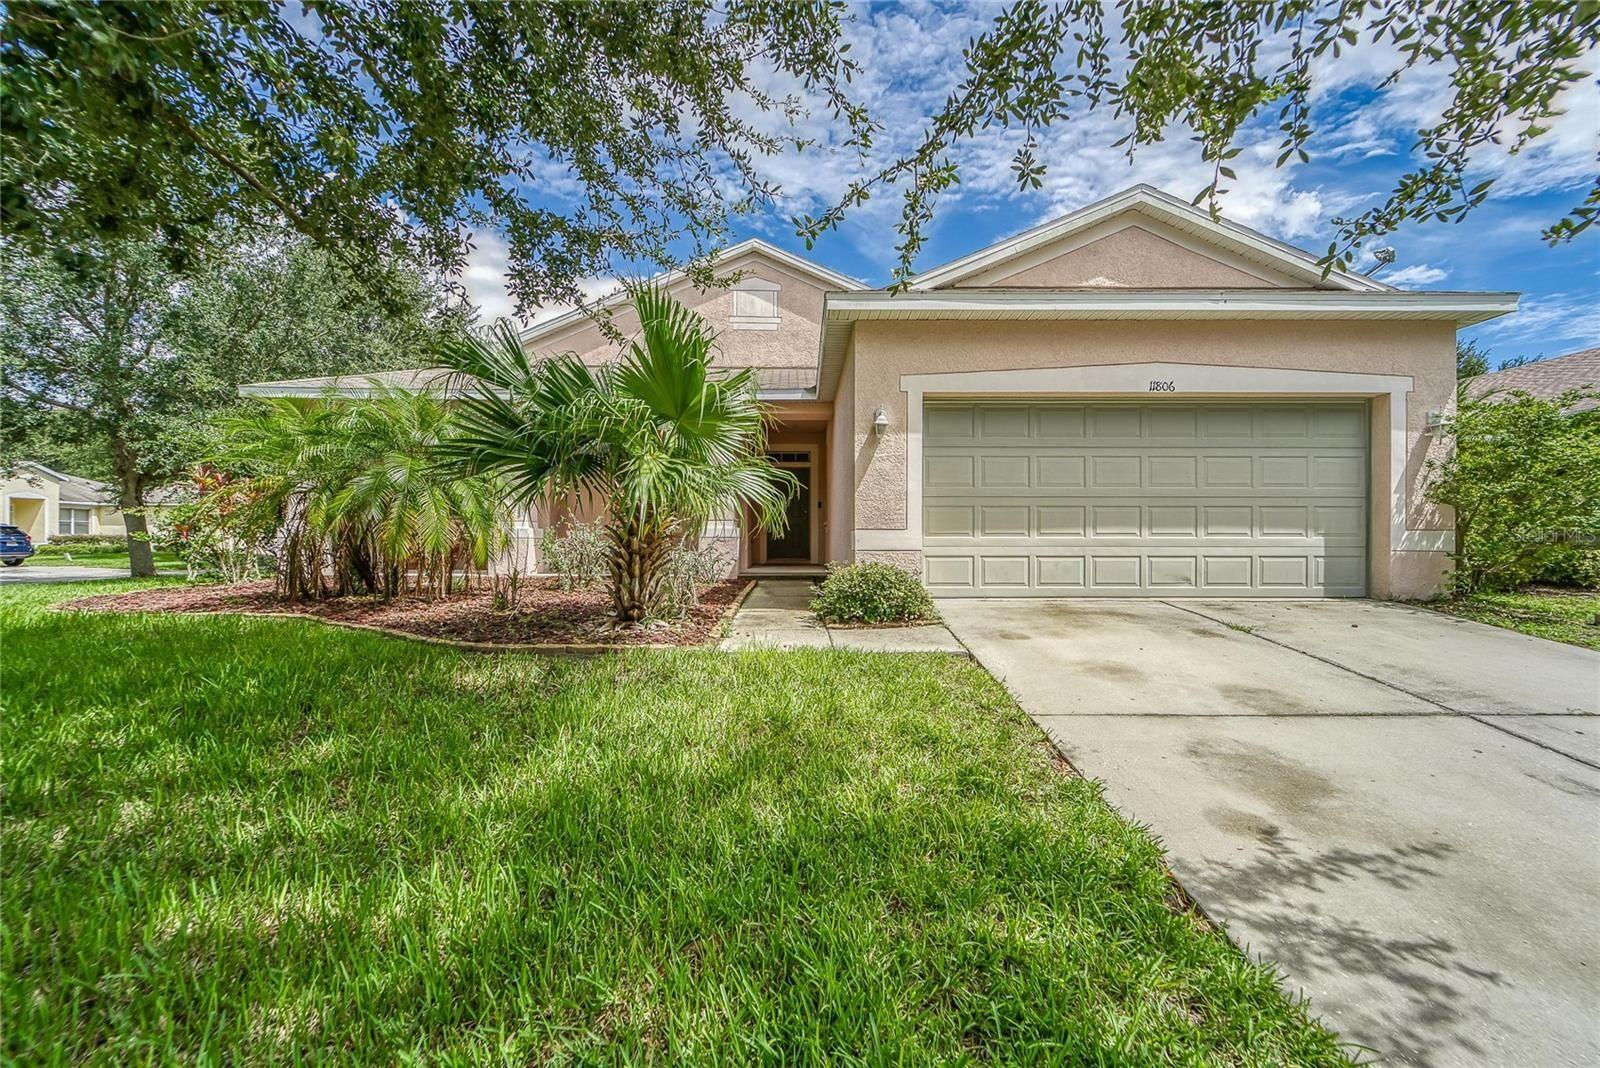 11806 HOLLY CREST LANE, Riverview, FL 33569 - MLS#: T3330201